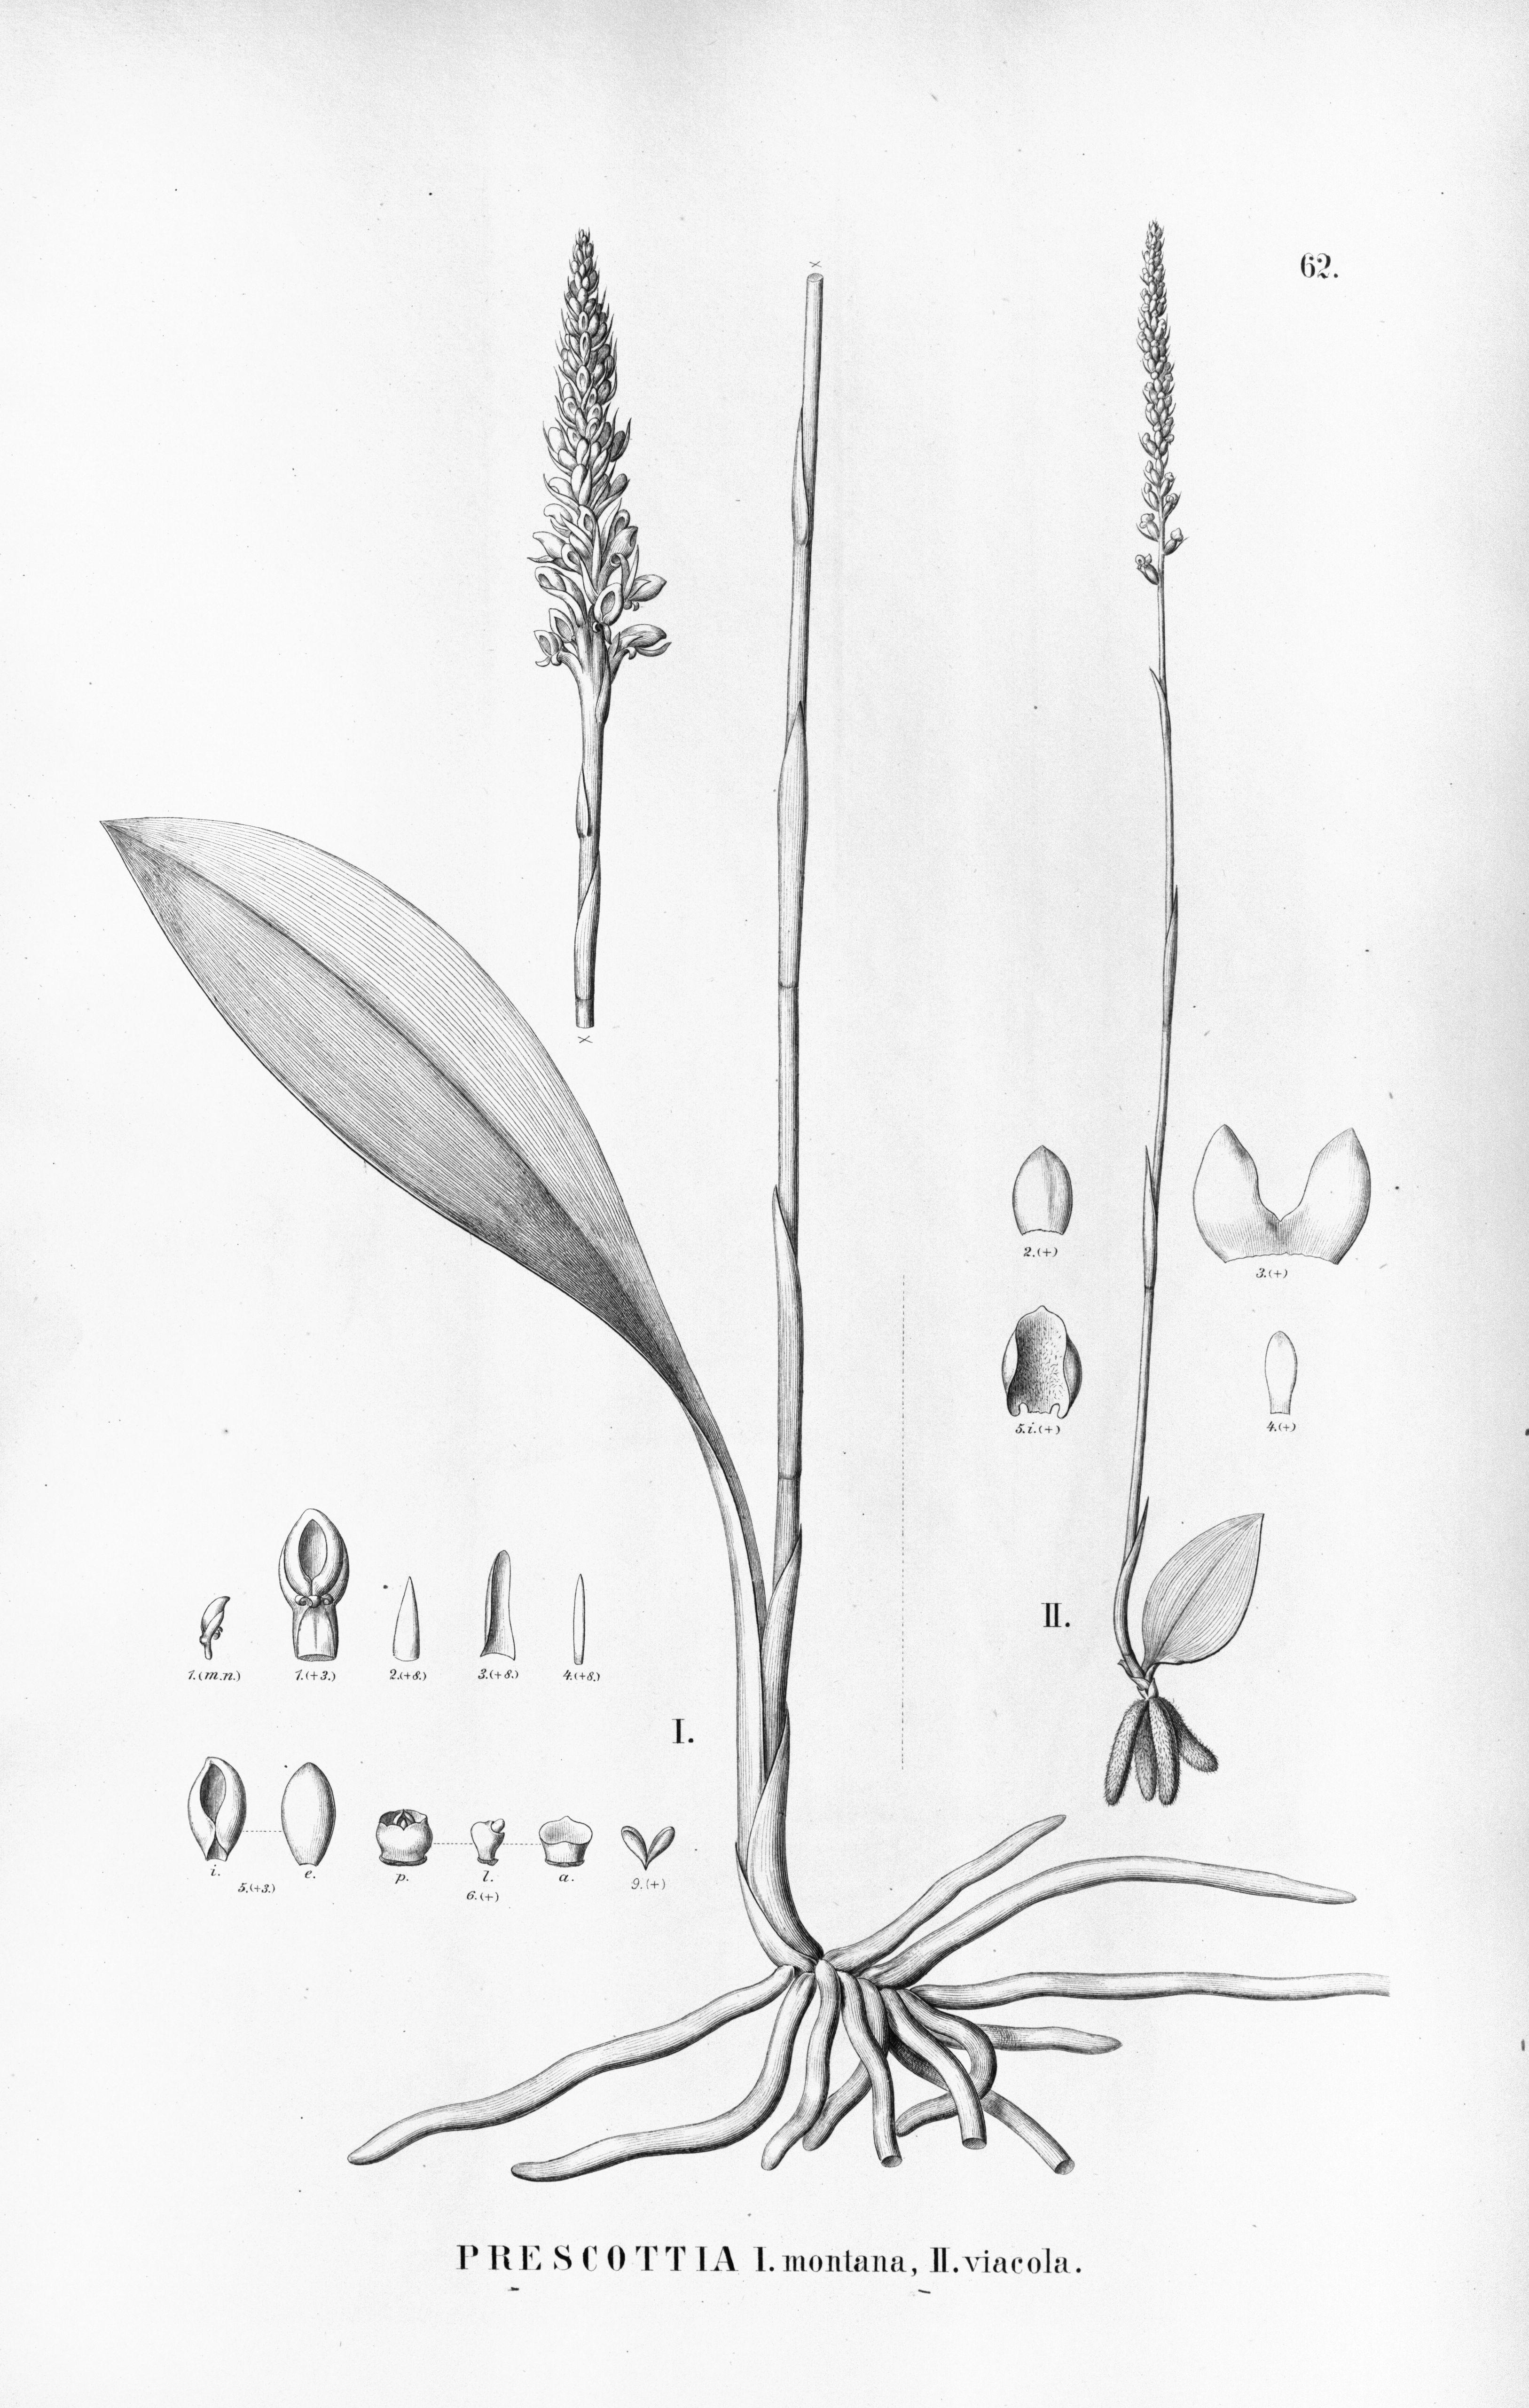 Image of Prescott orchids